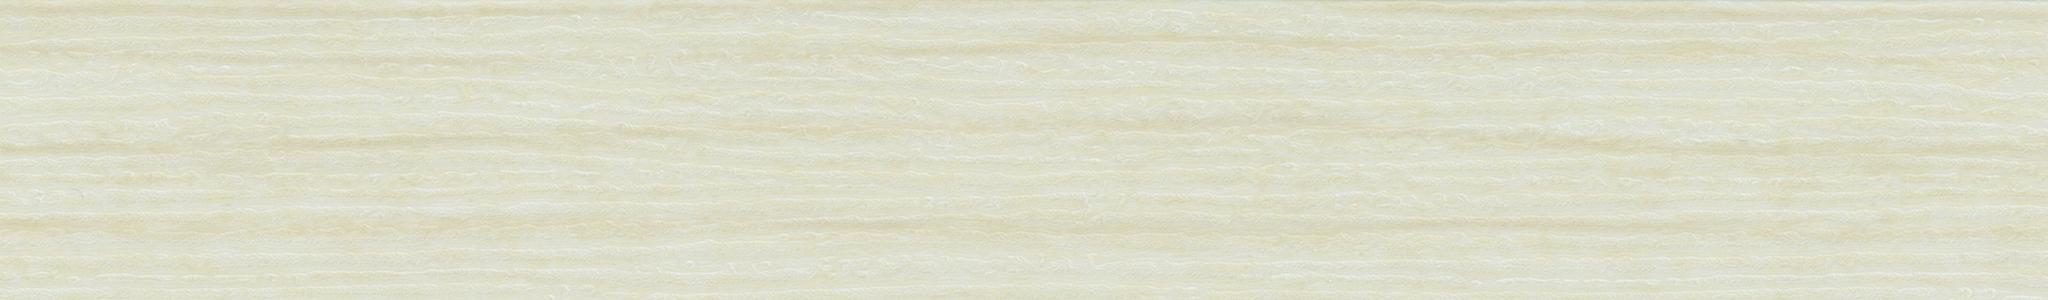 HD 267043 ABS hrana javor Kiruna hladký